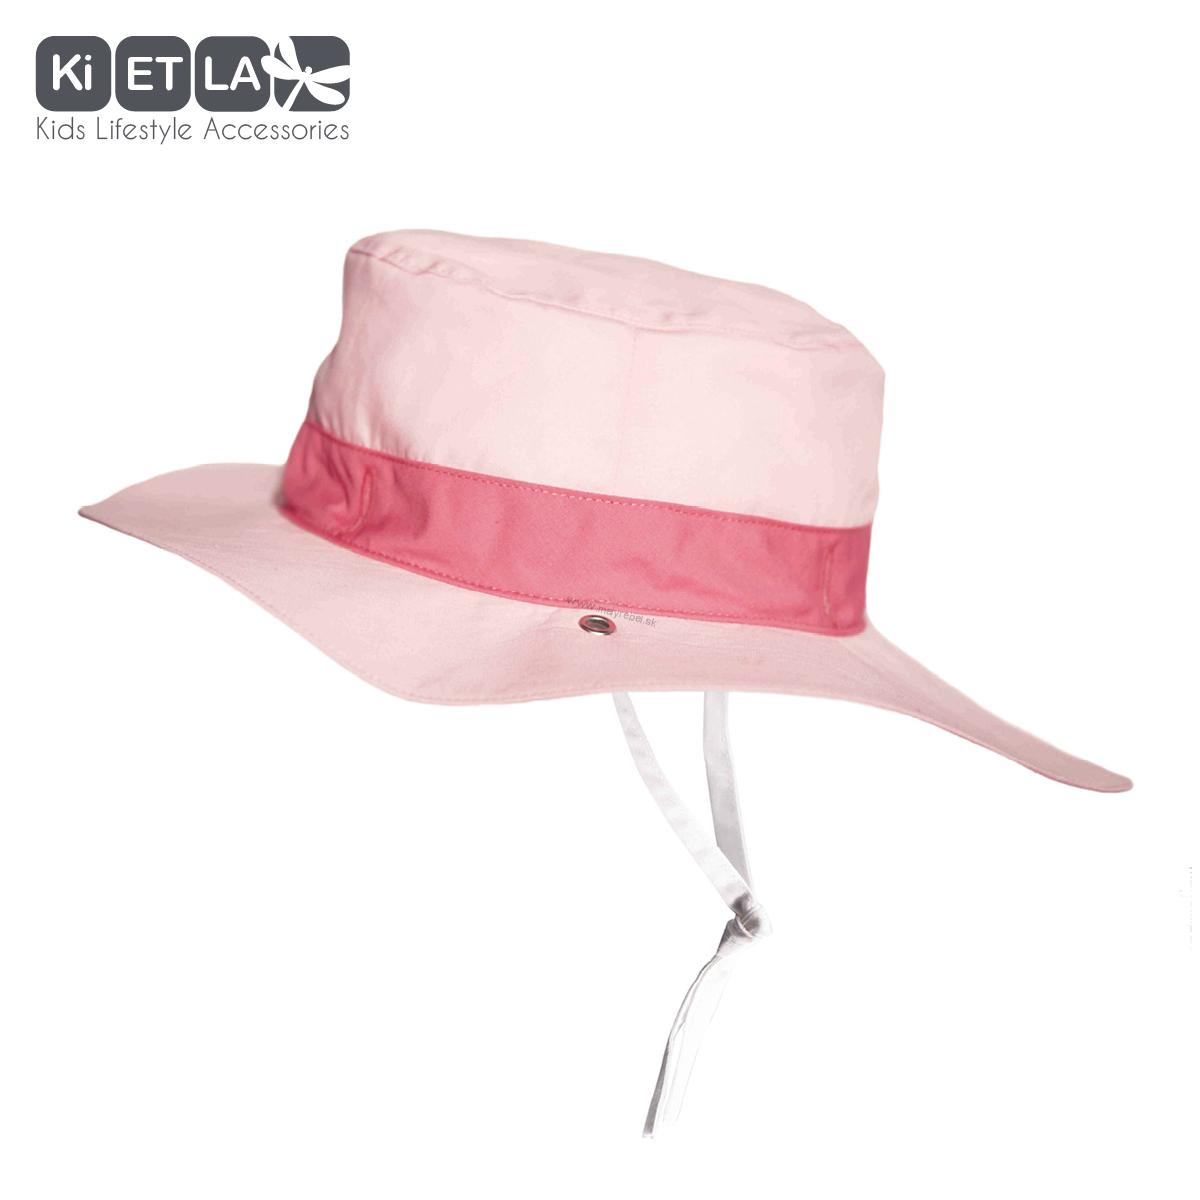 ec6ab9798907 KiETLA obojstranný klobúčik s UV ochranou- panama pink- 2-4roky